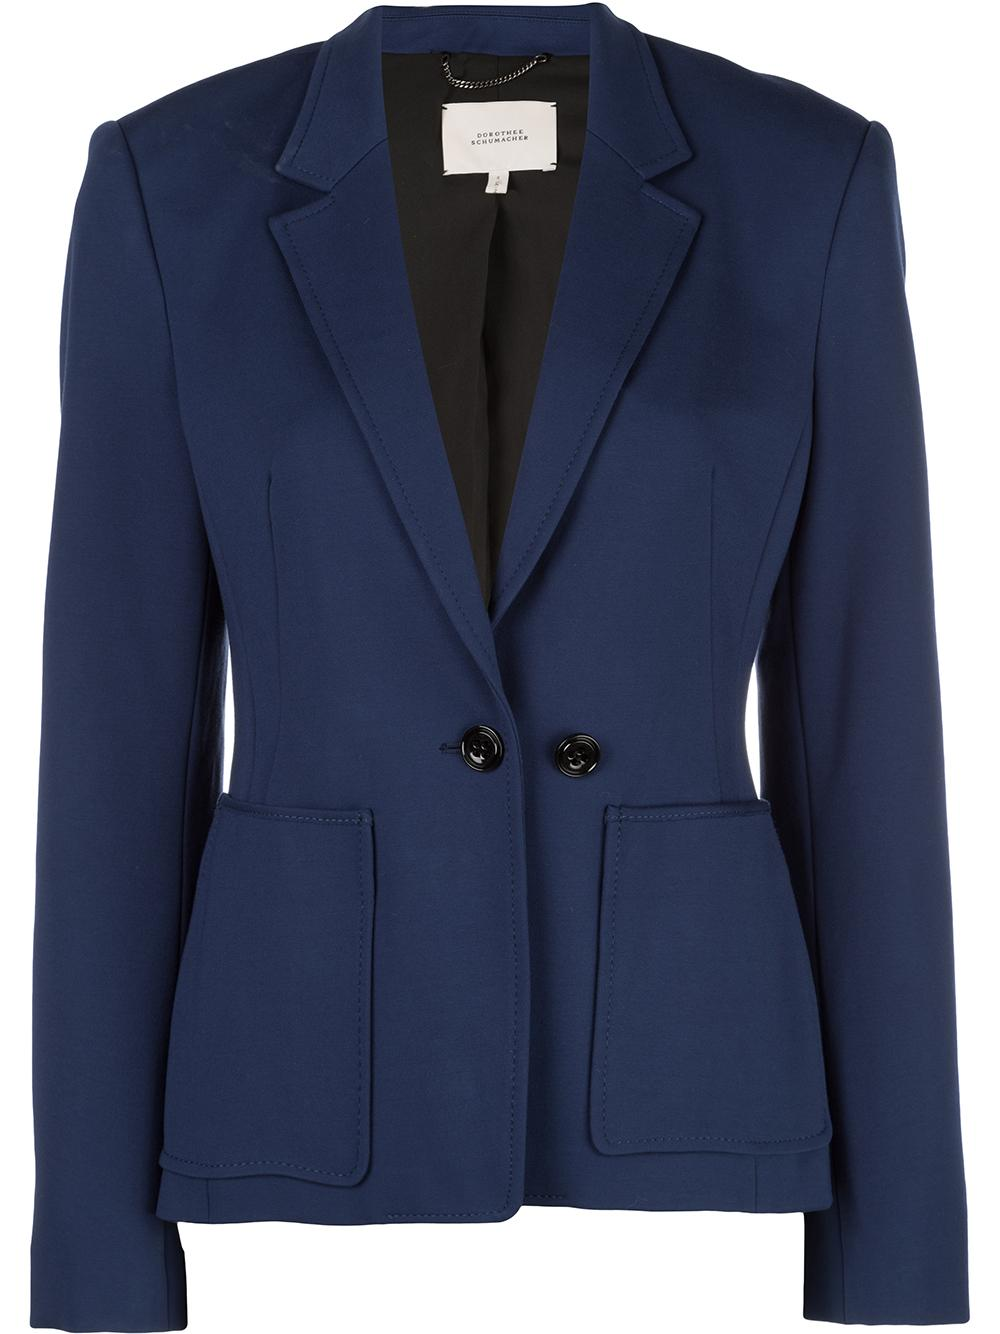 Emotional Essence Jacket Item # 548015